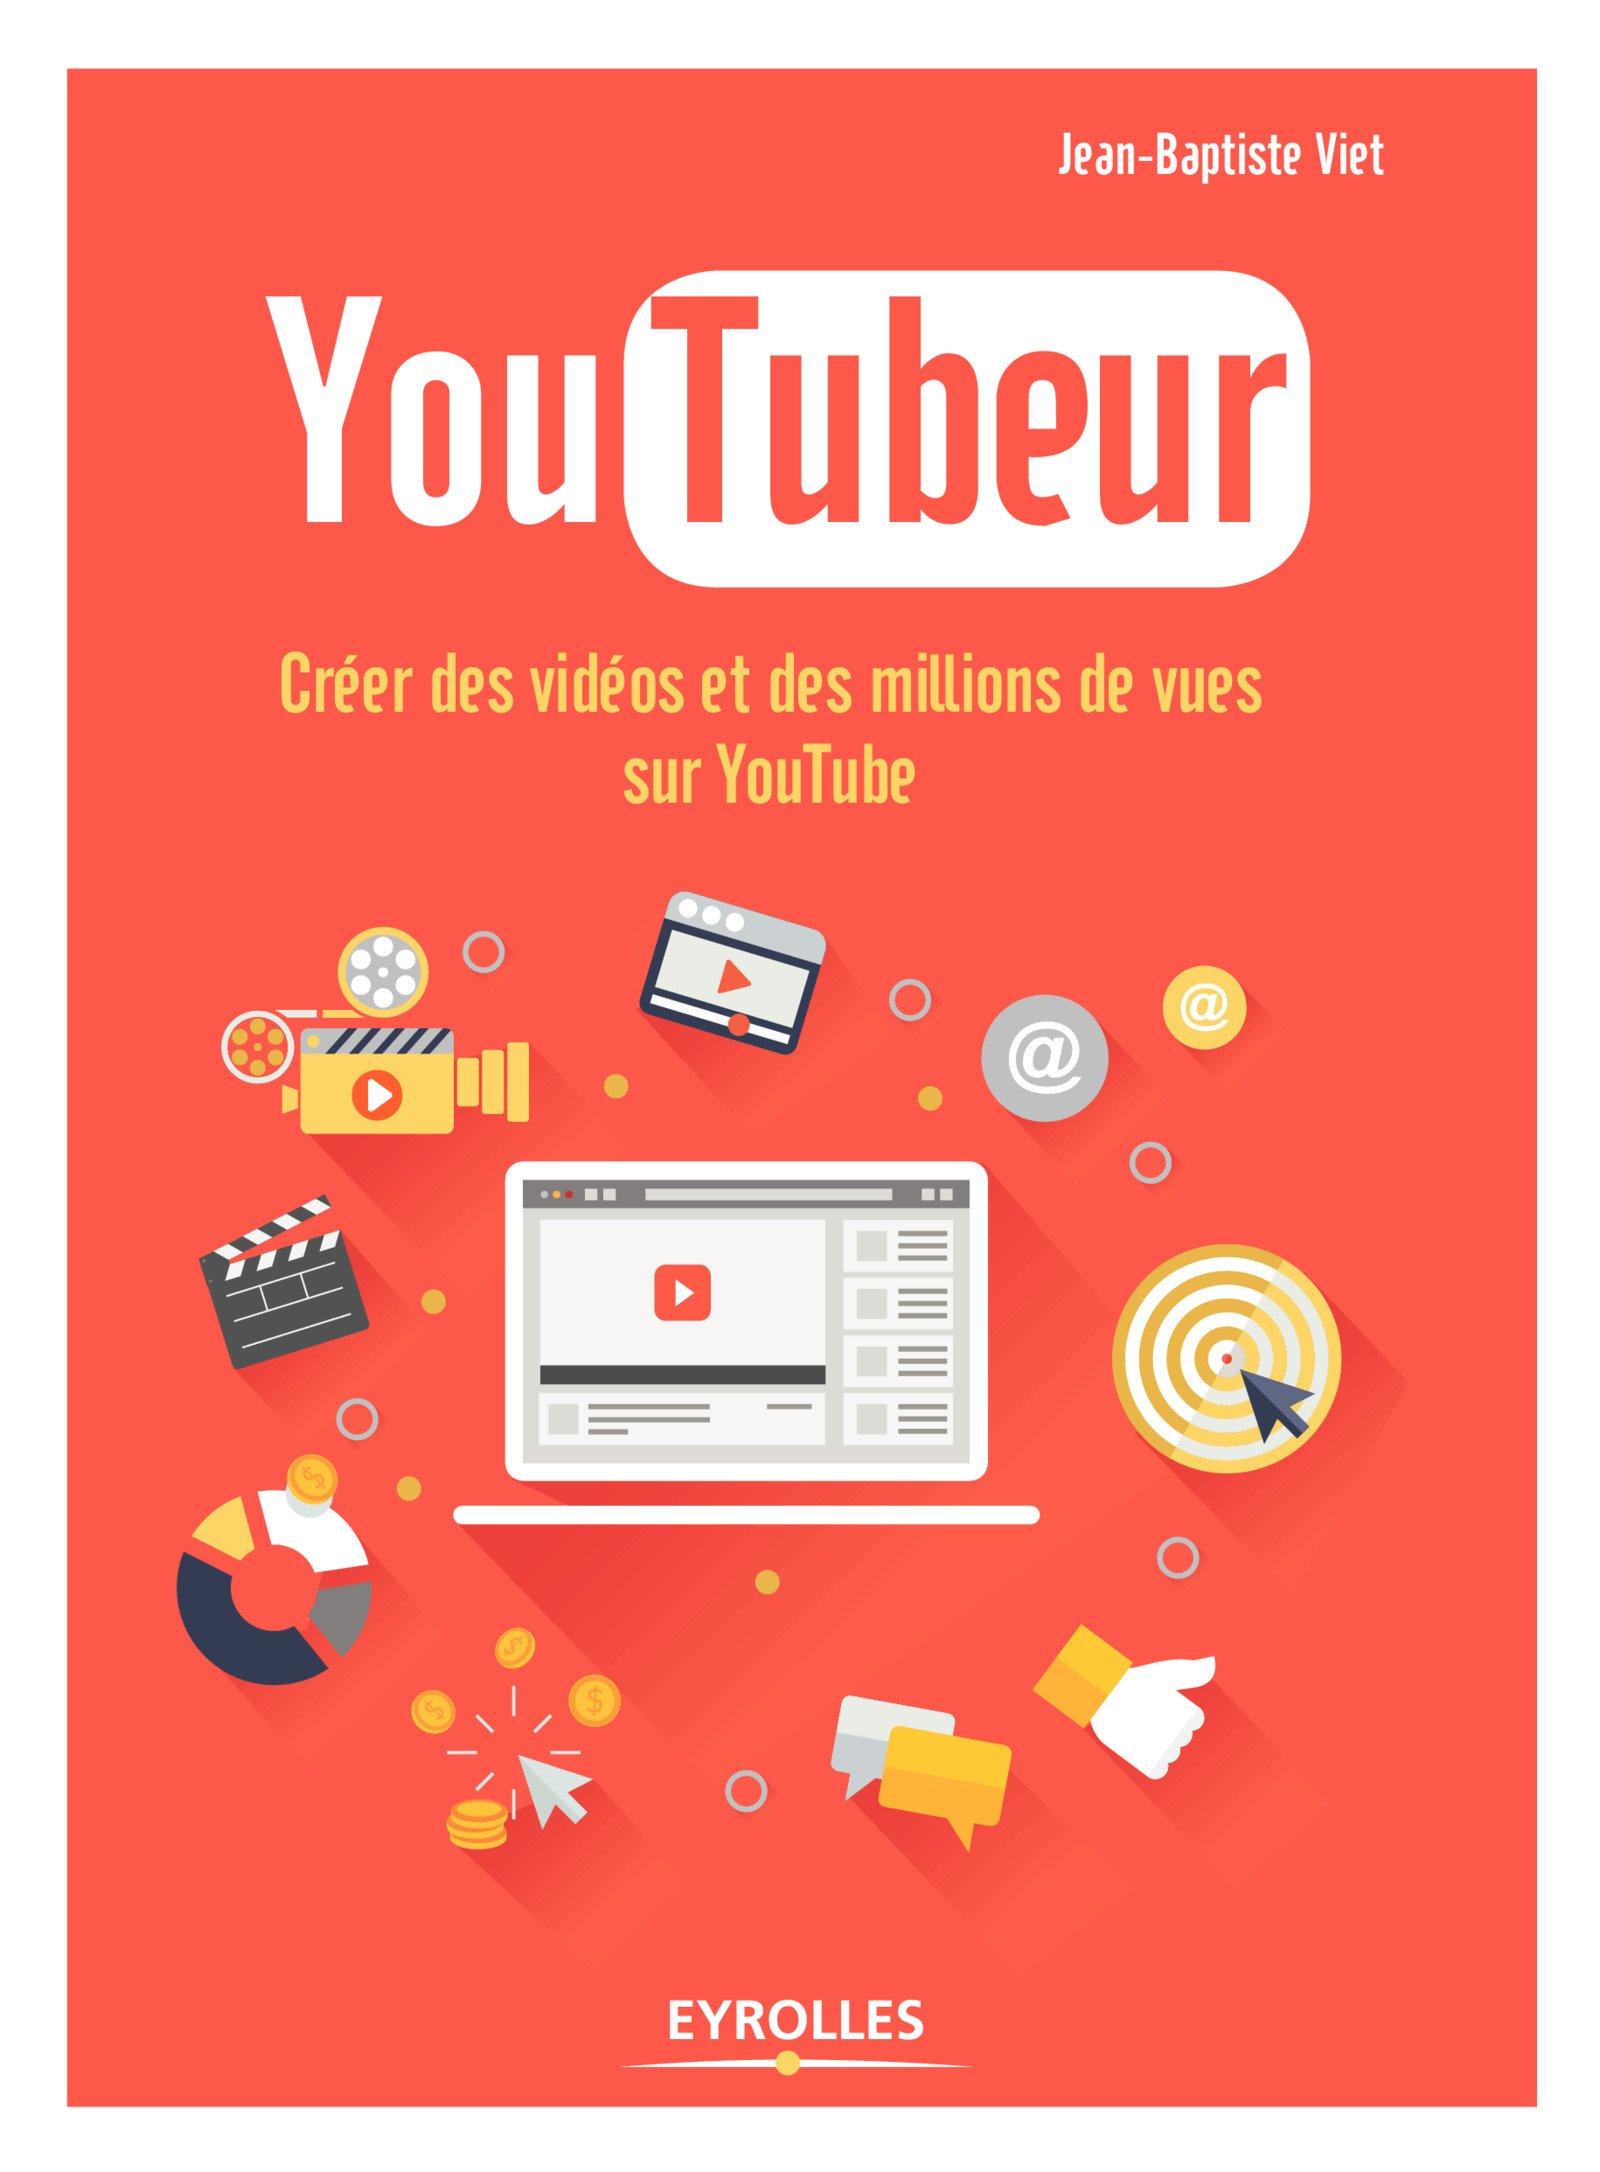 YouTubeur